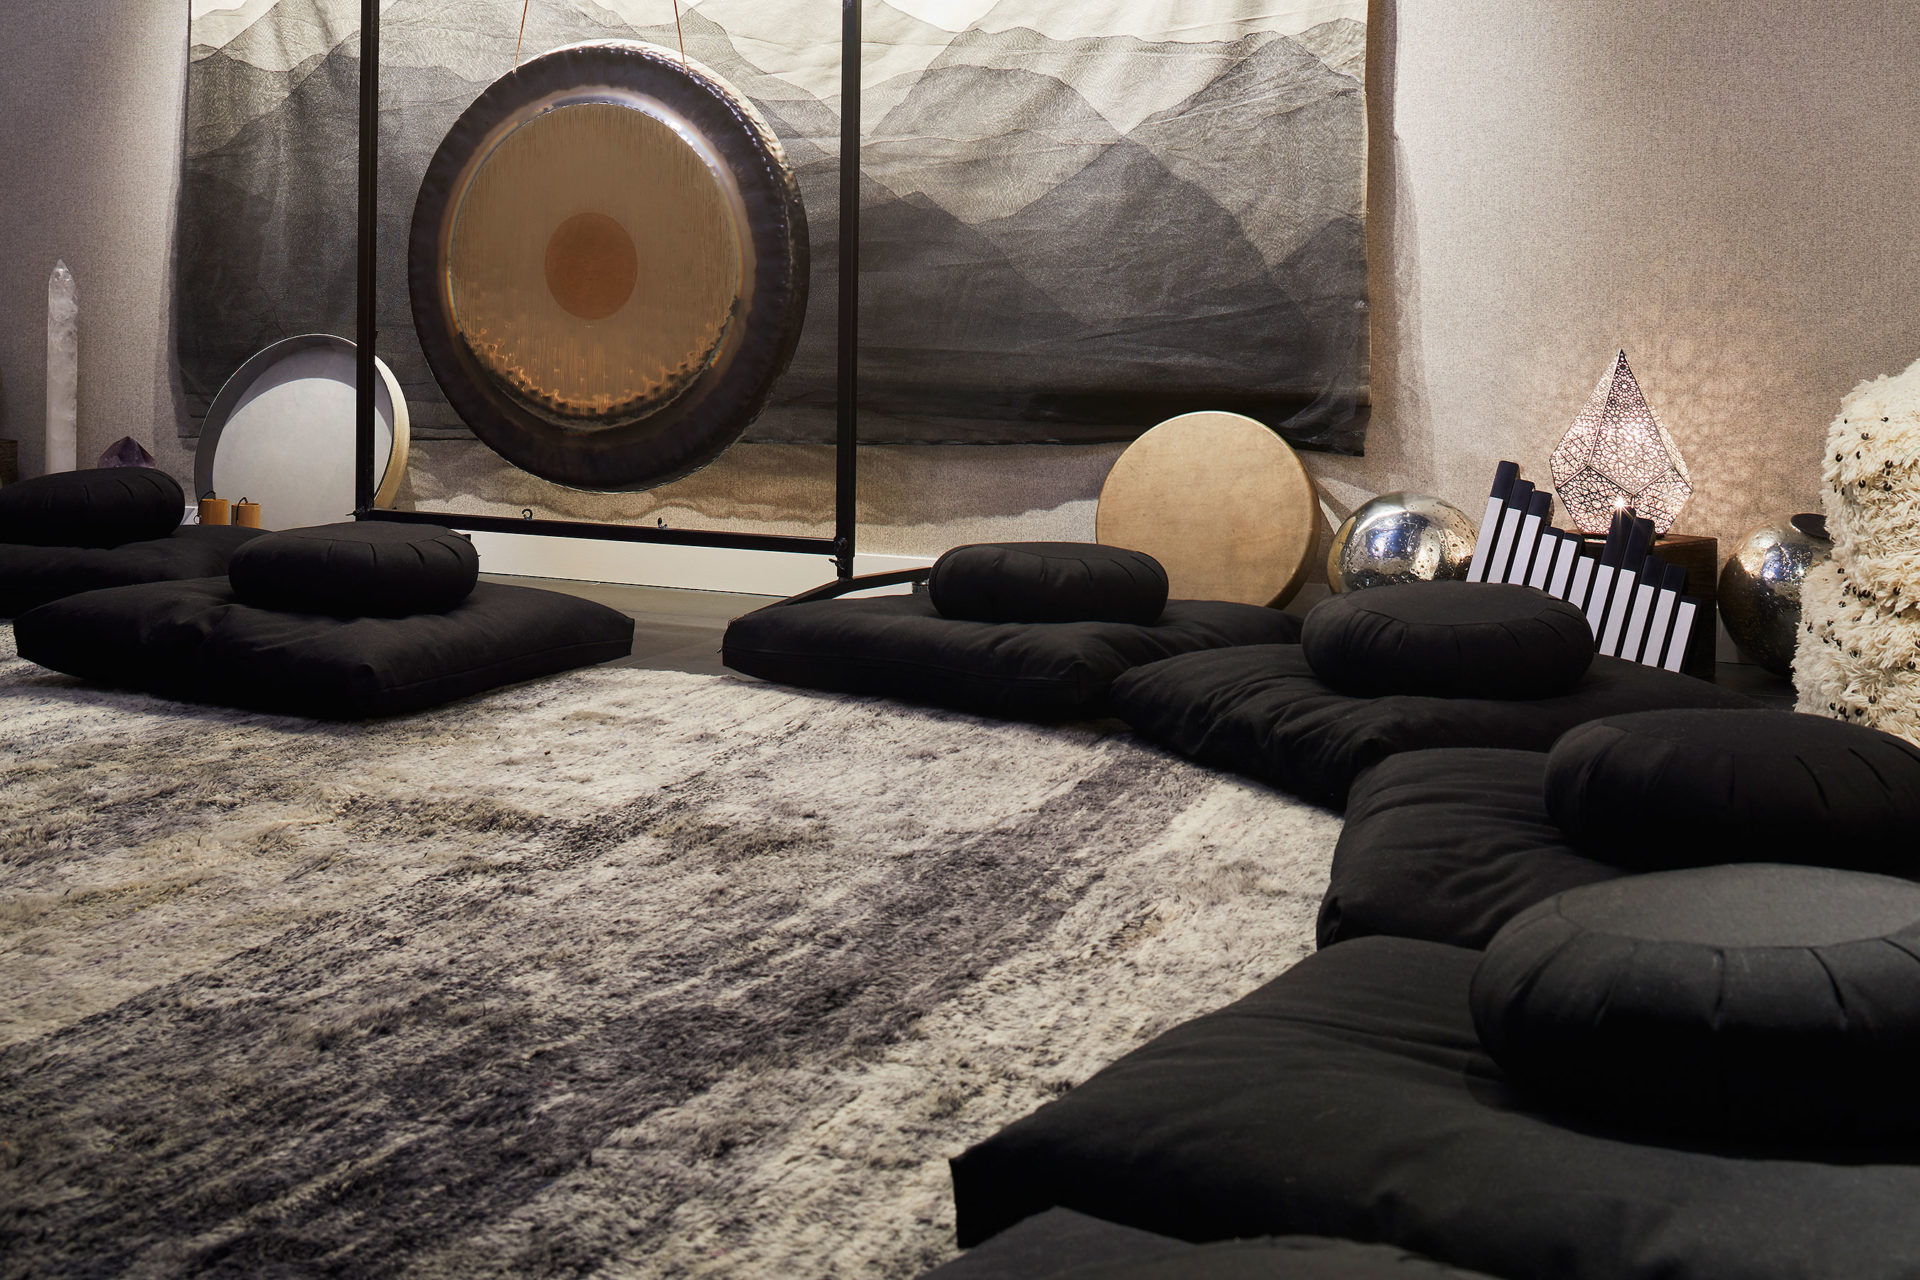 Wellness HotelCredit: Mikiko Kikuyama/Courtesy The Assemblage